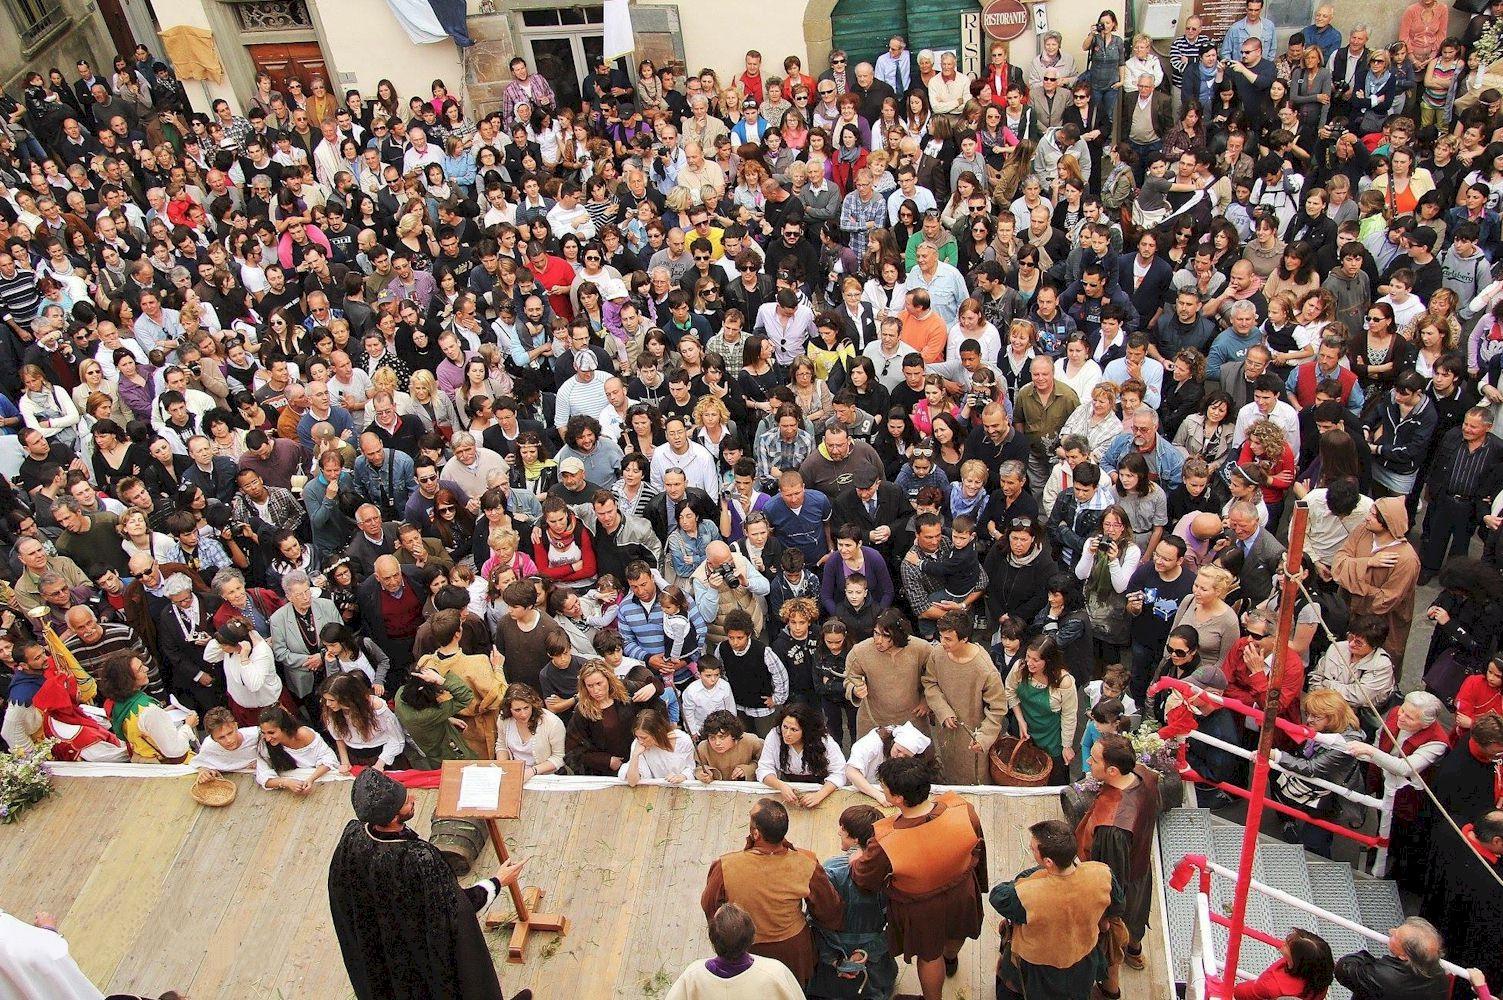 Festa della Stagion Bona in Panzano - Audience for the outdoors mediaeval play